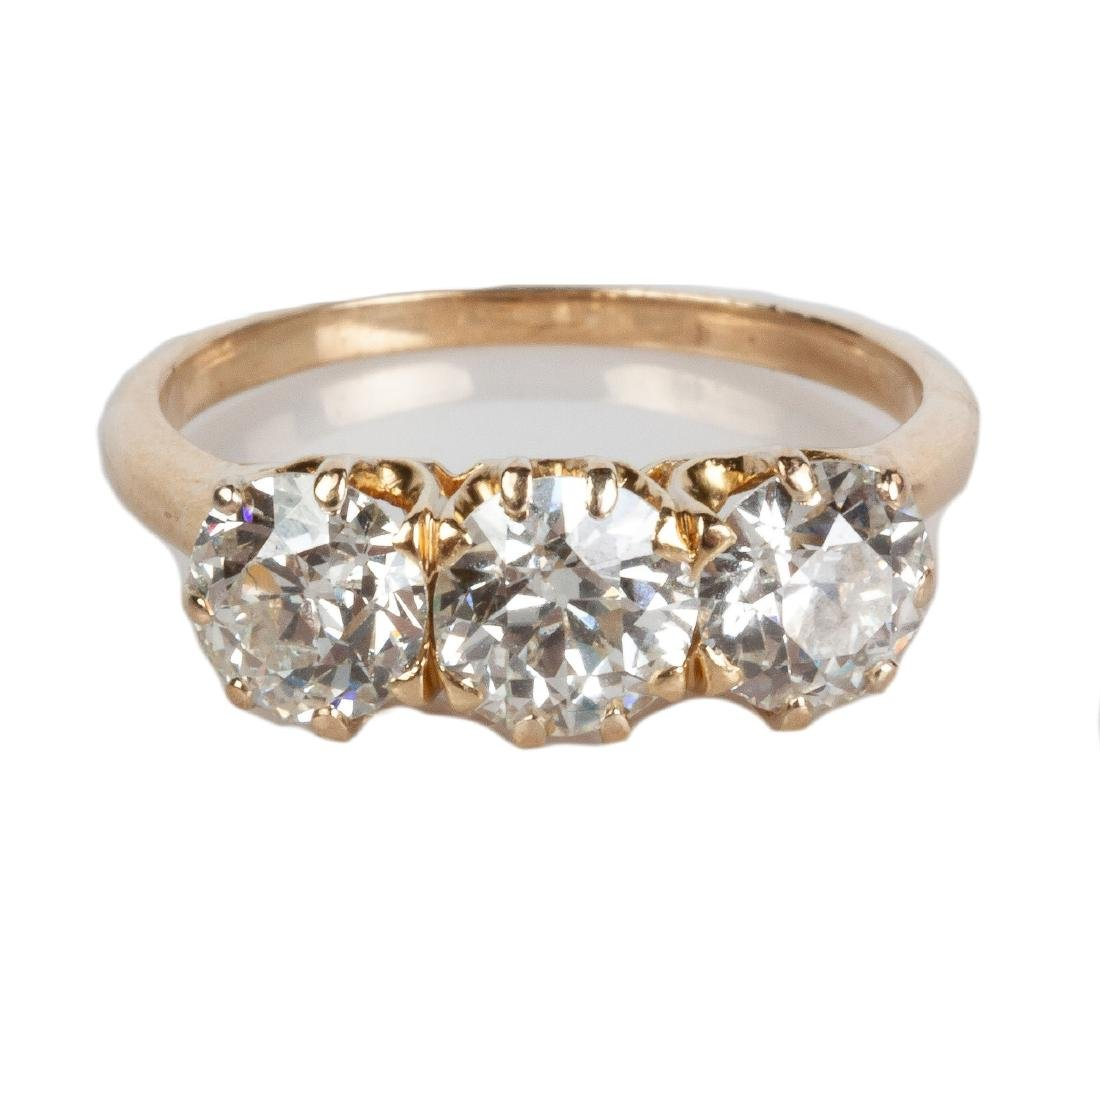 Lady's 14K Gold & Diamond Ring